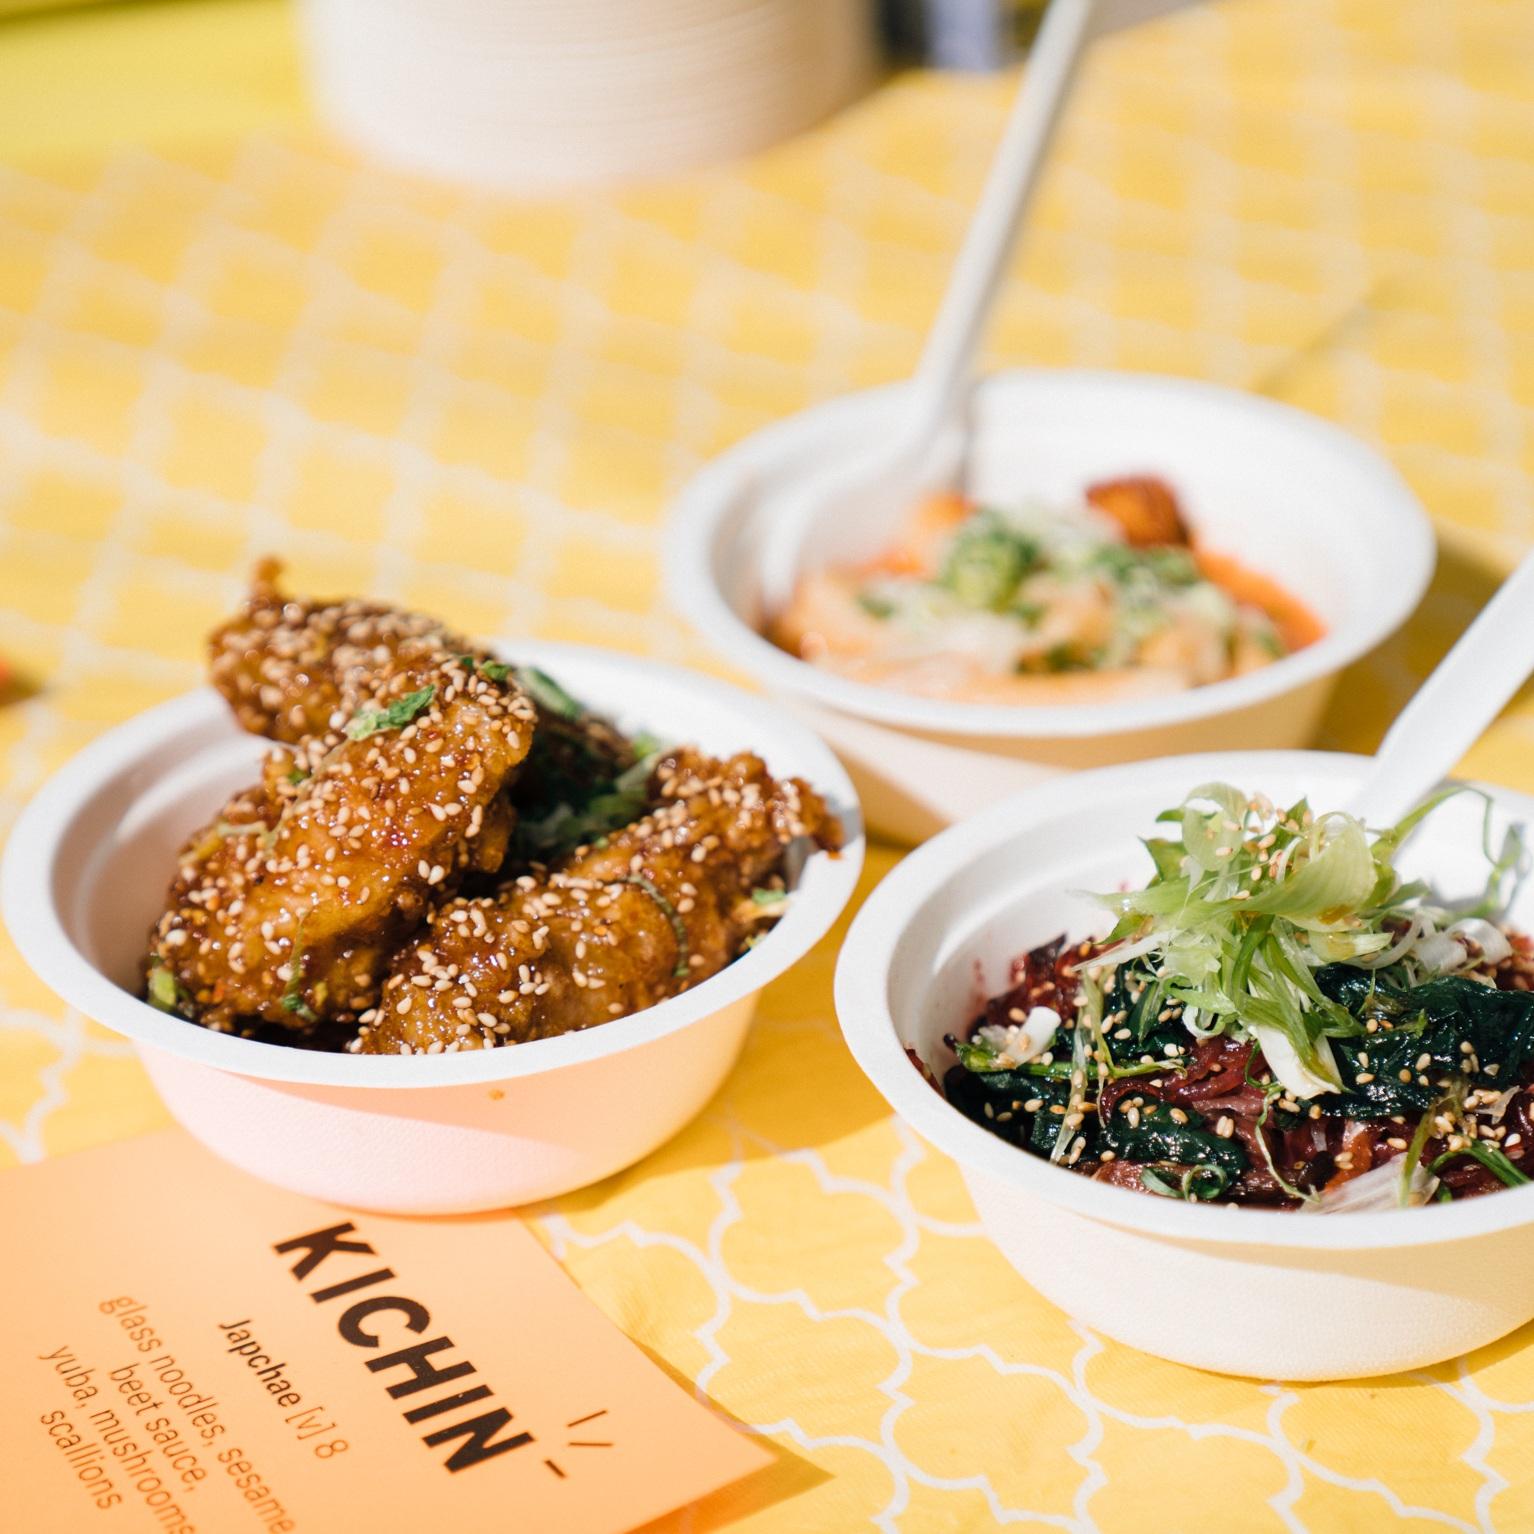 Kichin's spicy wings, ddukkbokki, and beet japchae. Photo by Janice Chung for HFNM 2019.